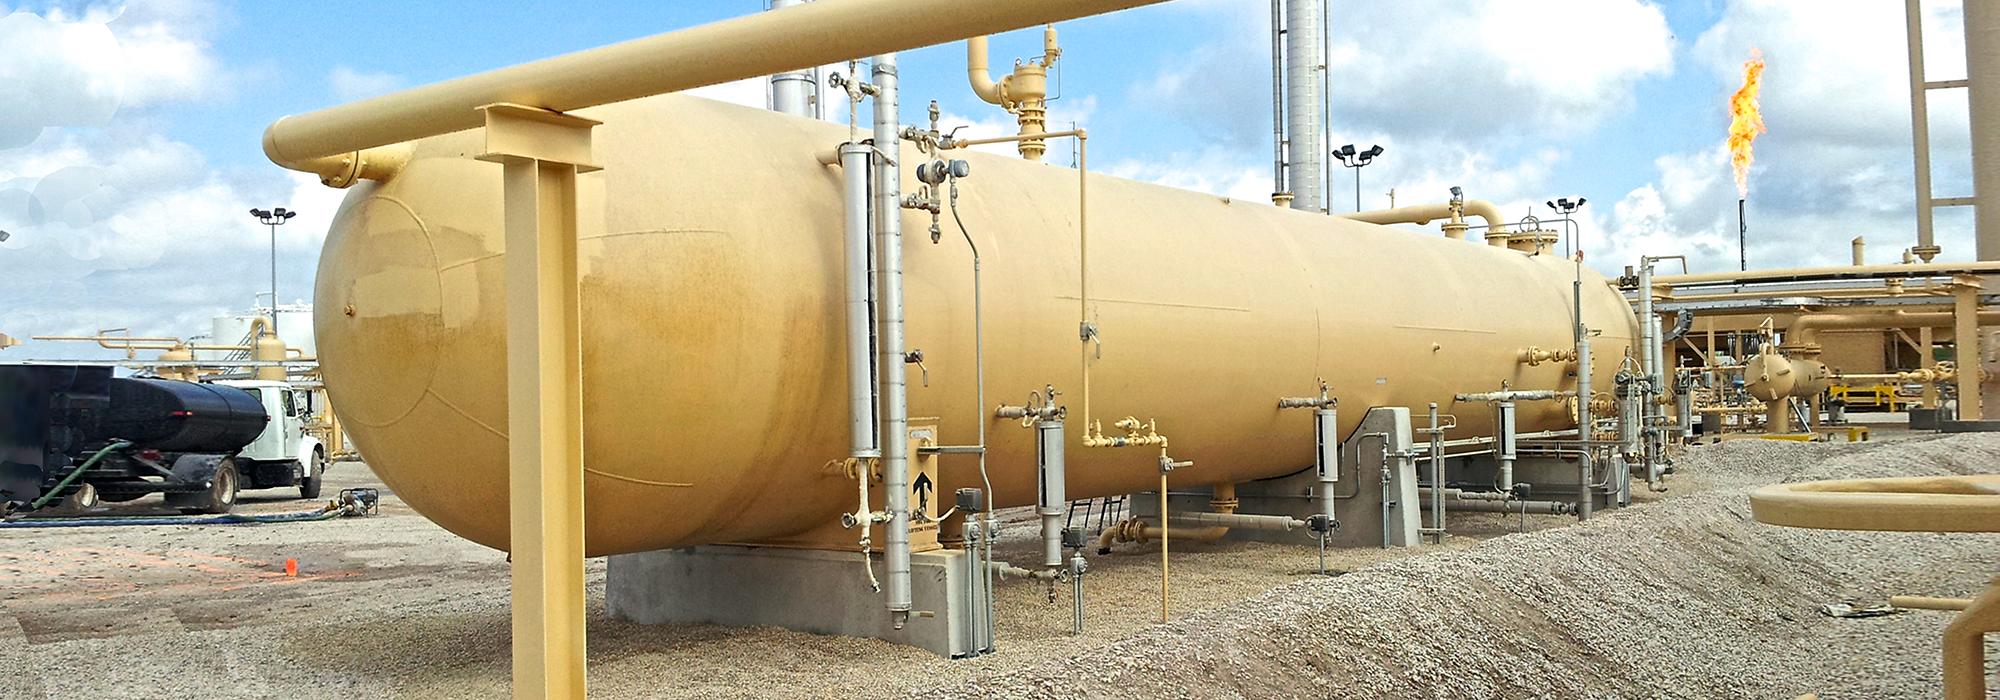 ASME_NGL_LPG_Process_Vessel_Fabrication-1.png